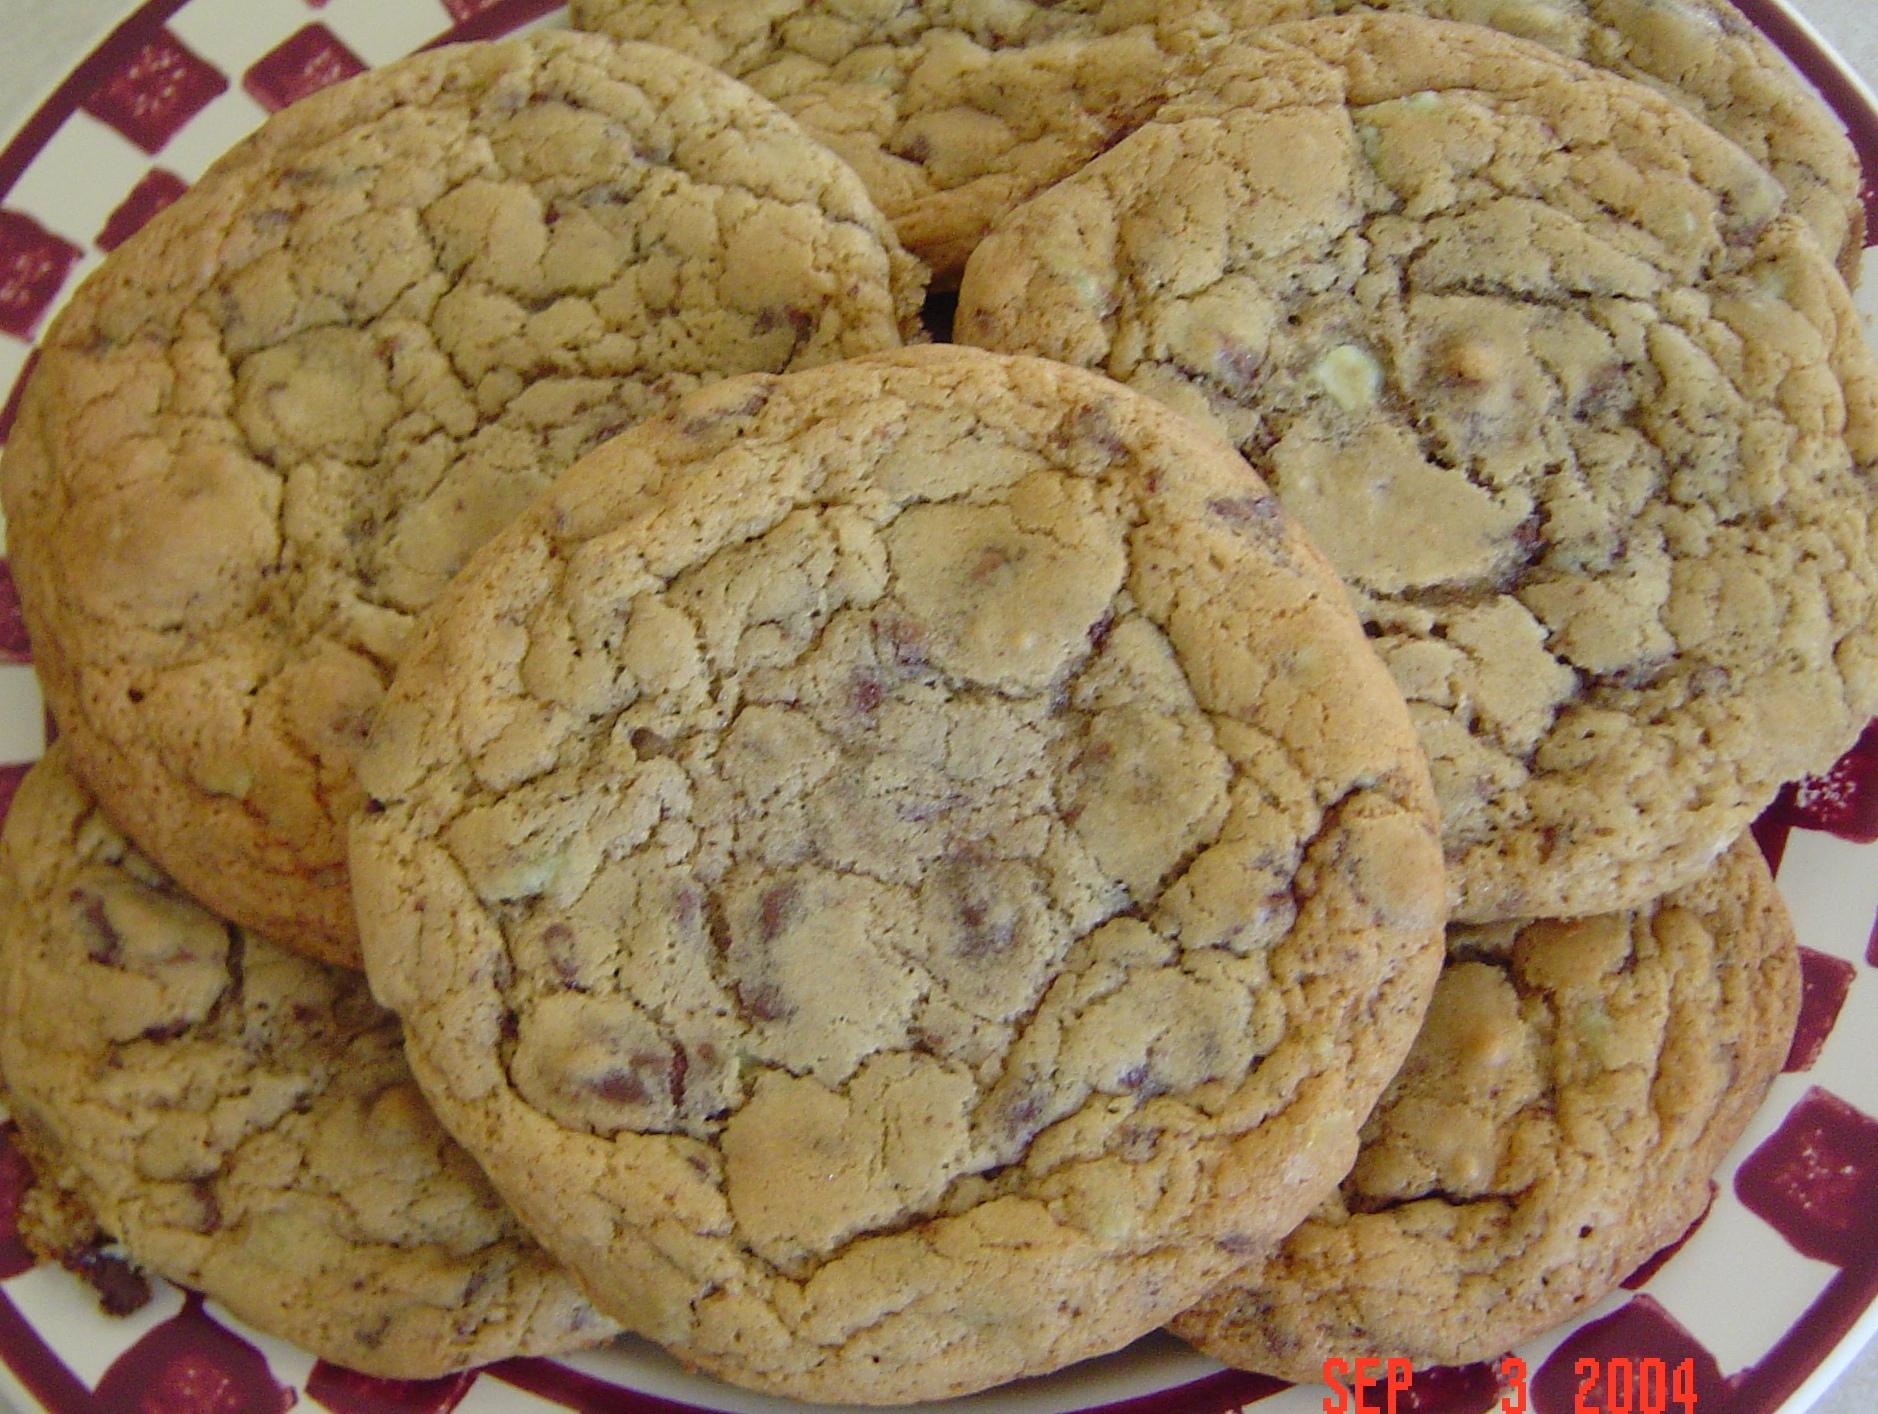 Andes Crème De Menthe Cookies – Andes Mint Cookies Recipe